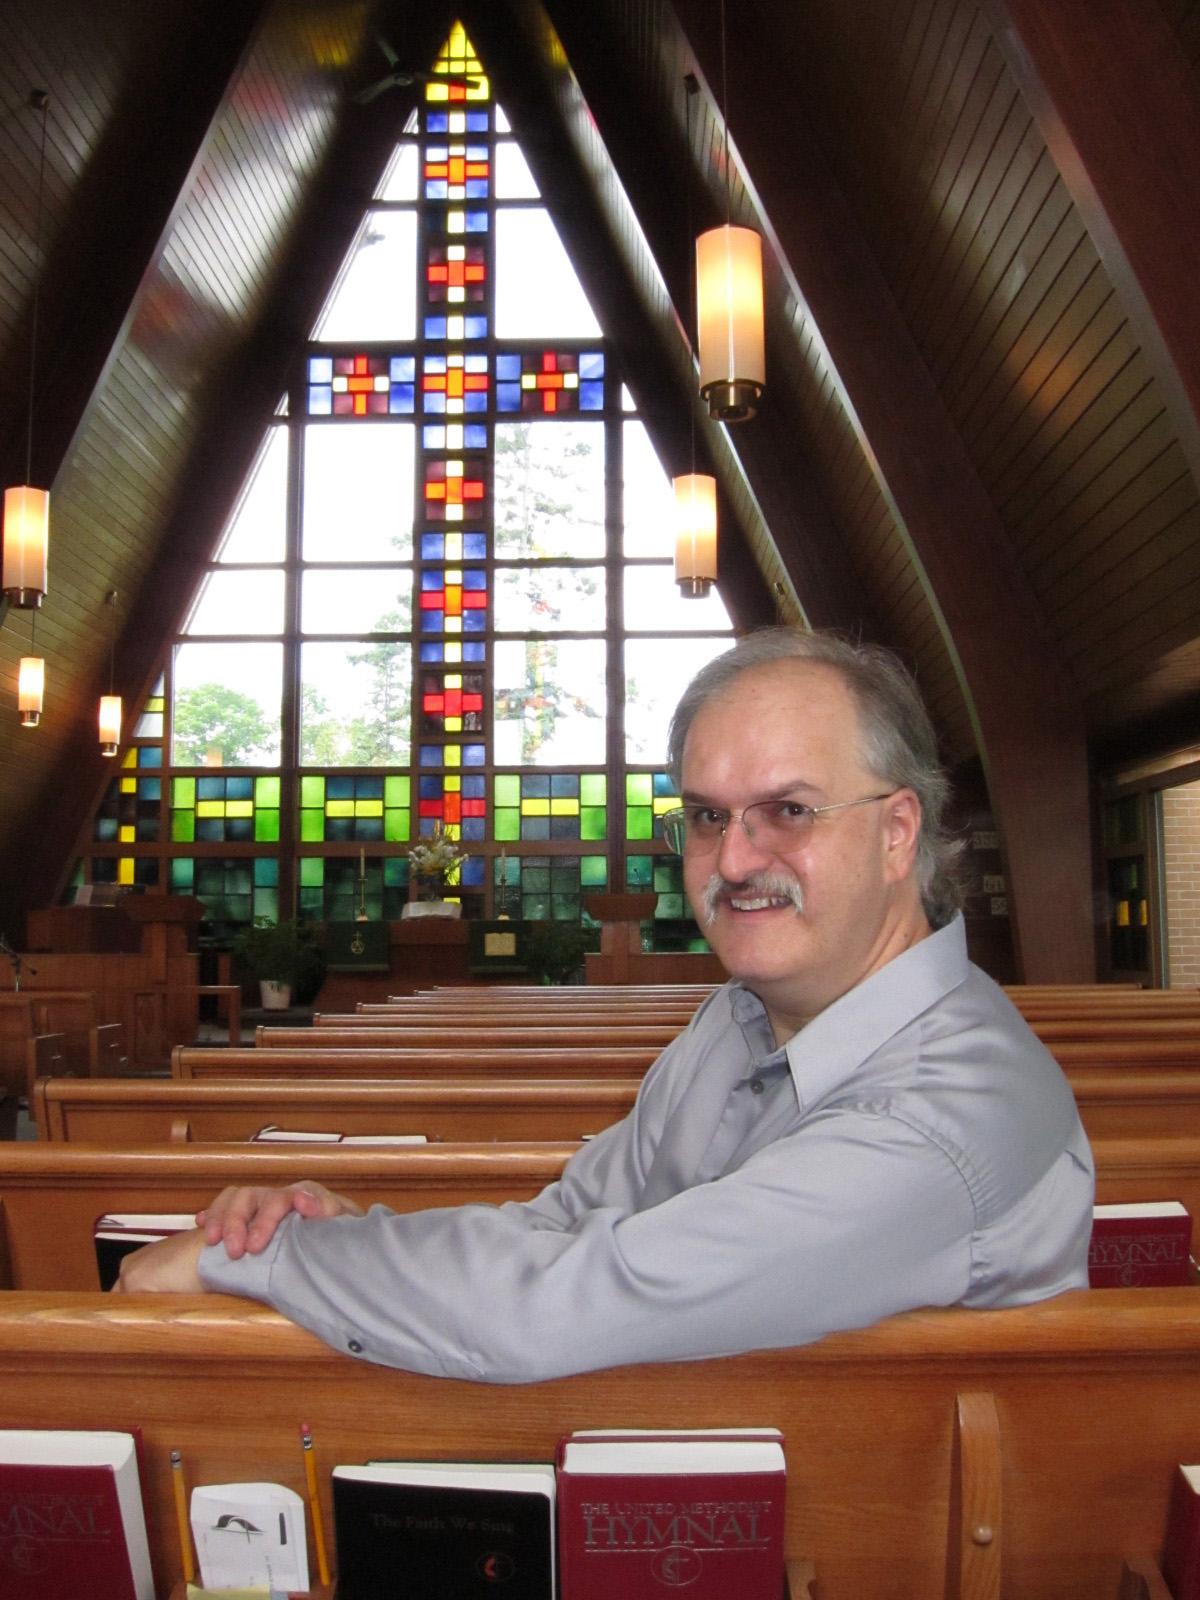 The Rev. Erik Alsgaard inside St. Ignace United Methodist Church in St. Ignace, Michigan. A UMNS photo by Kathleen Barry.